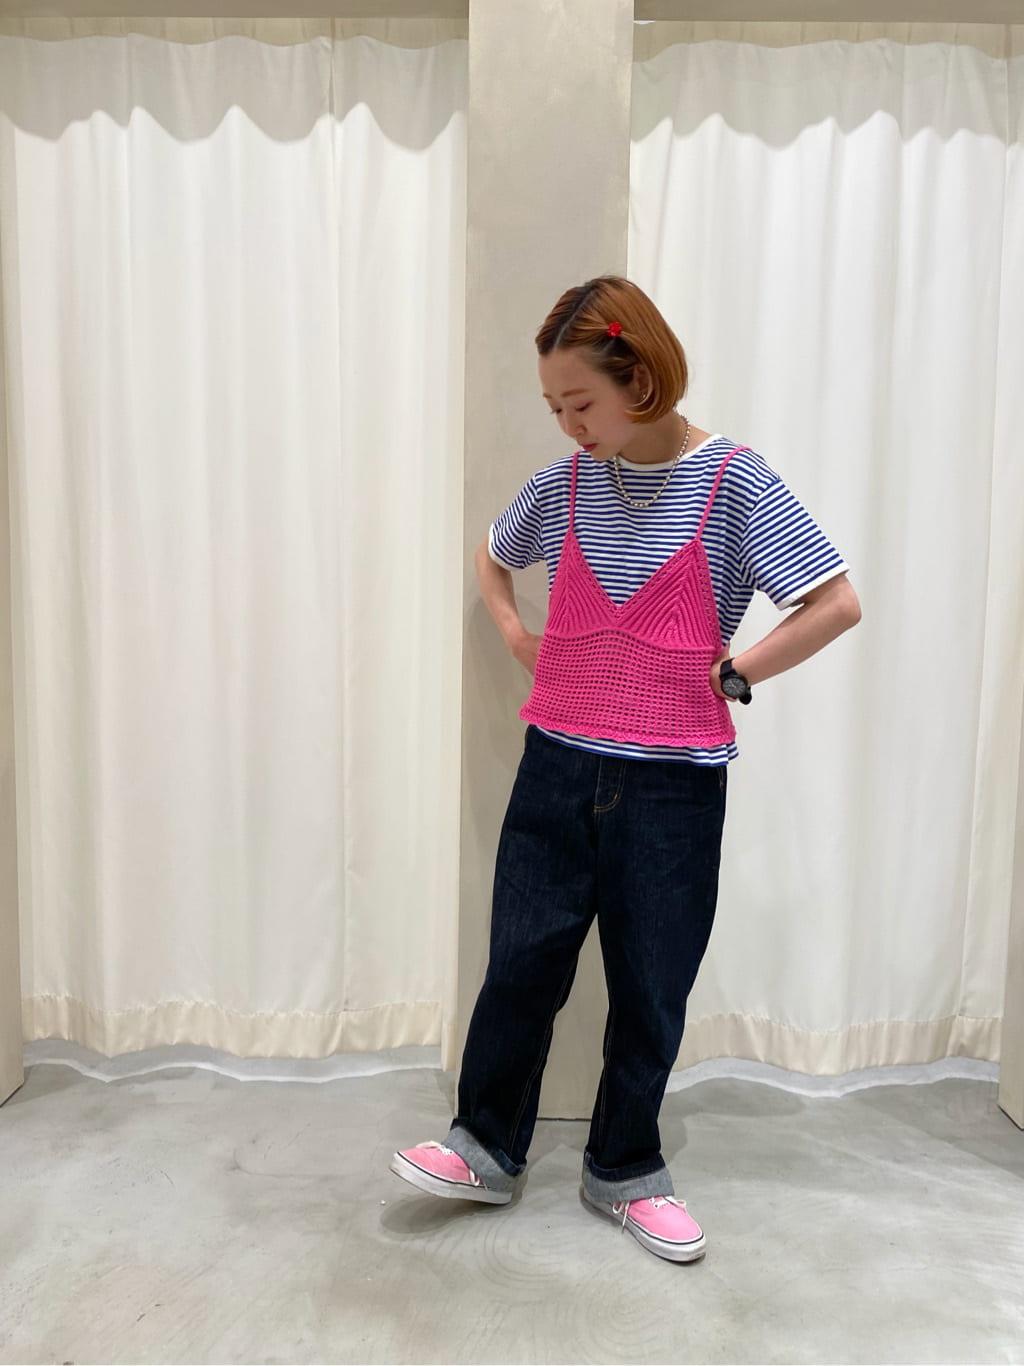 - CHILD WOMAN CHILD WOMAN , PAR ICI 東京スカイツリータウン・ソラマチ 身長:150cm 2021.07.26